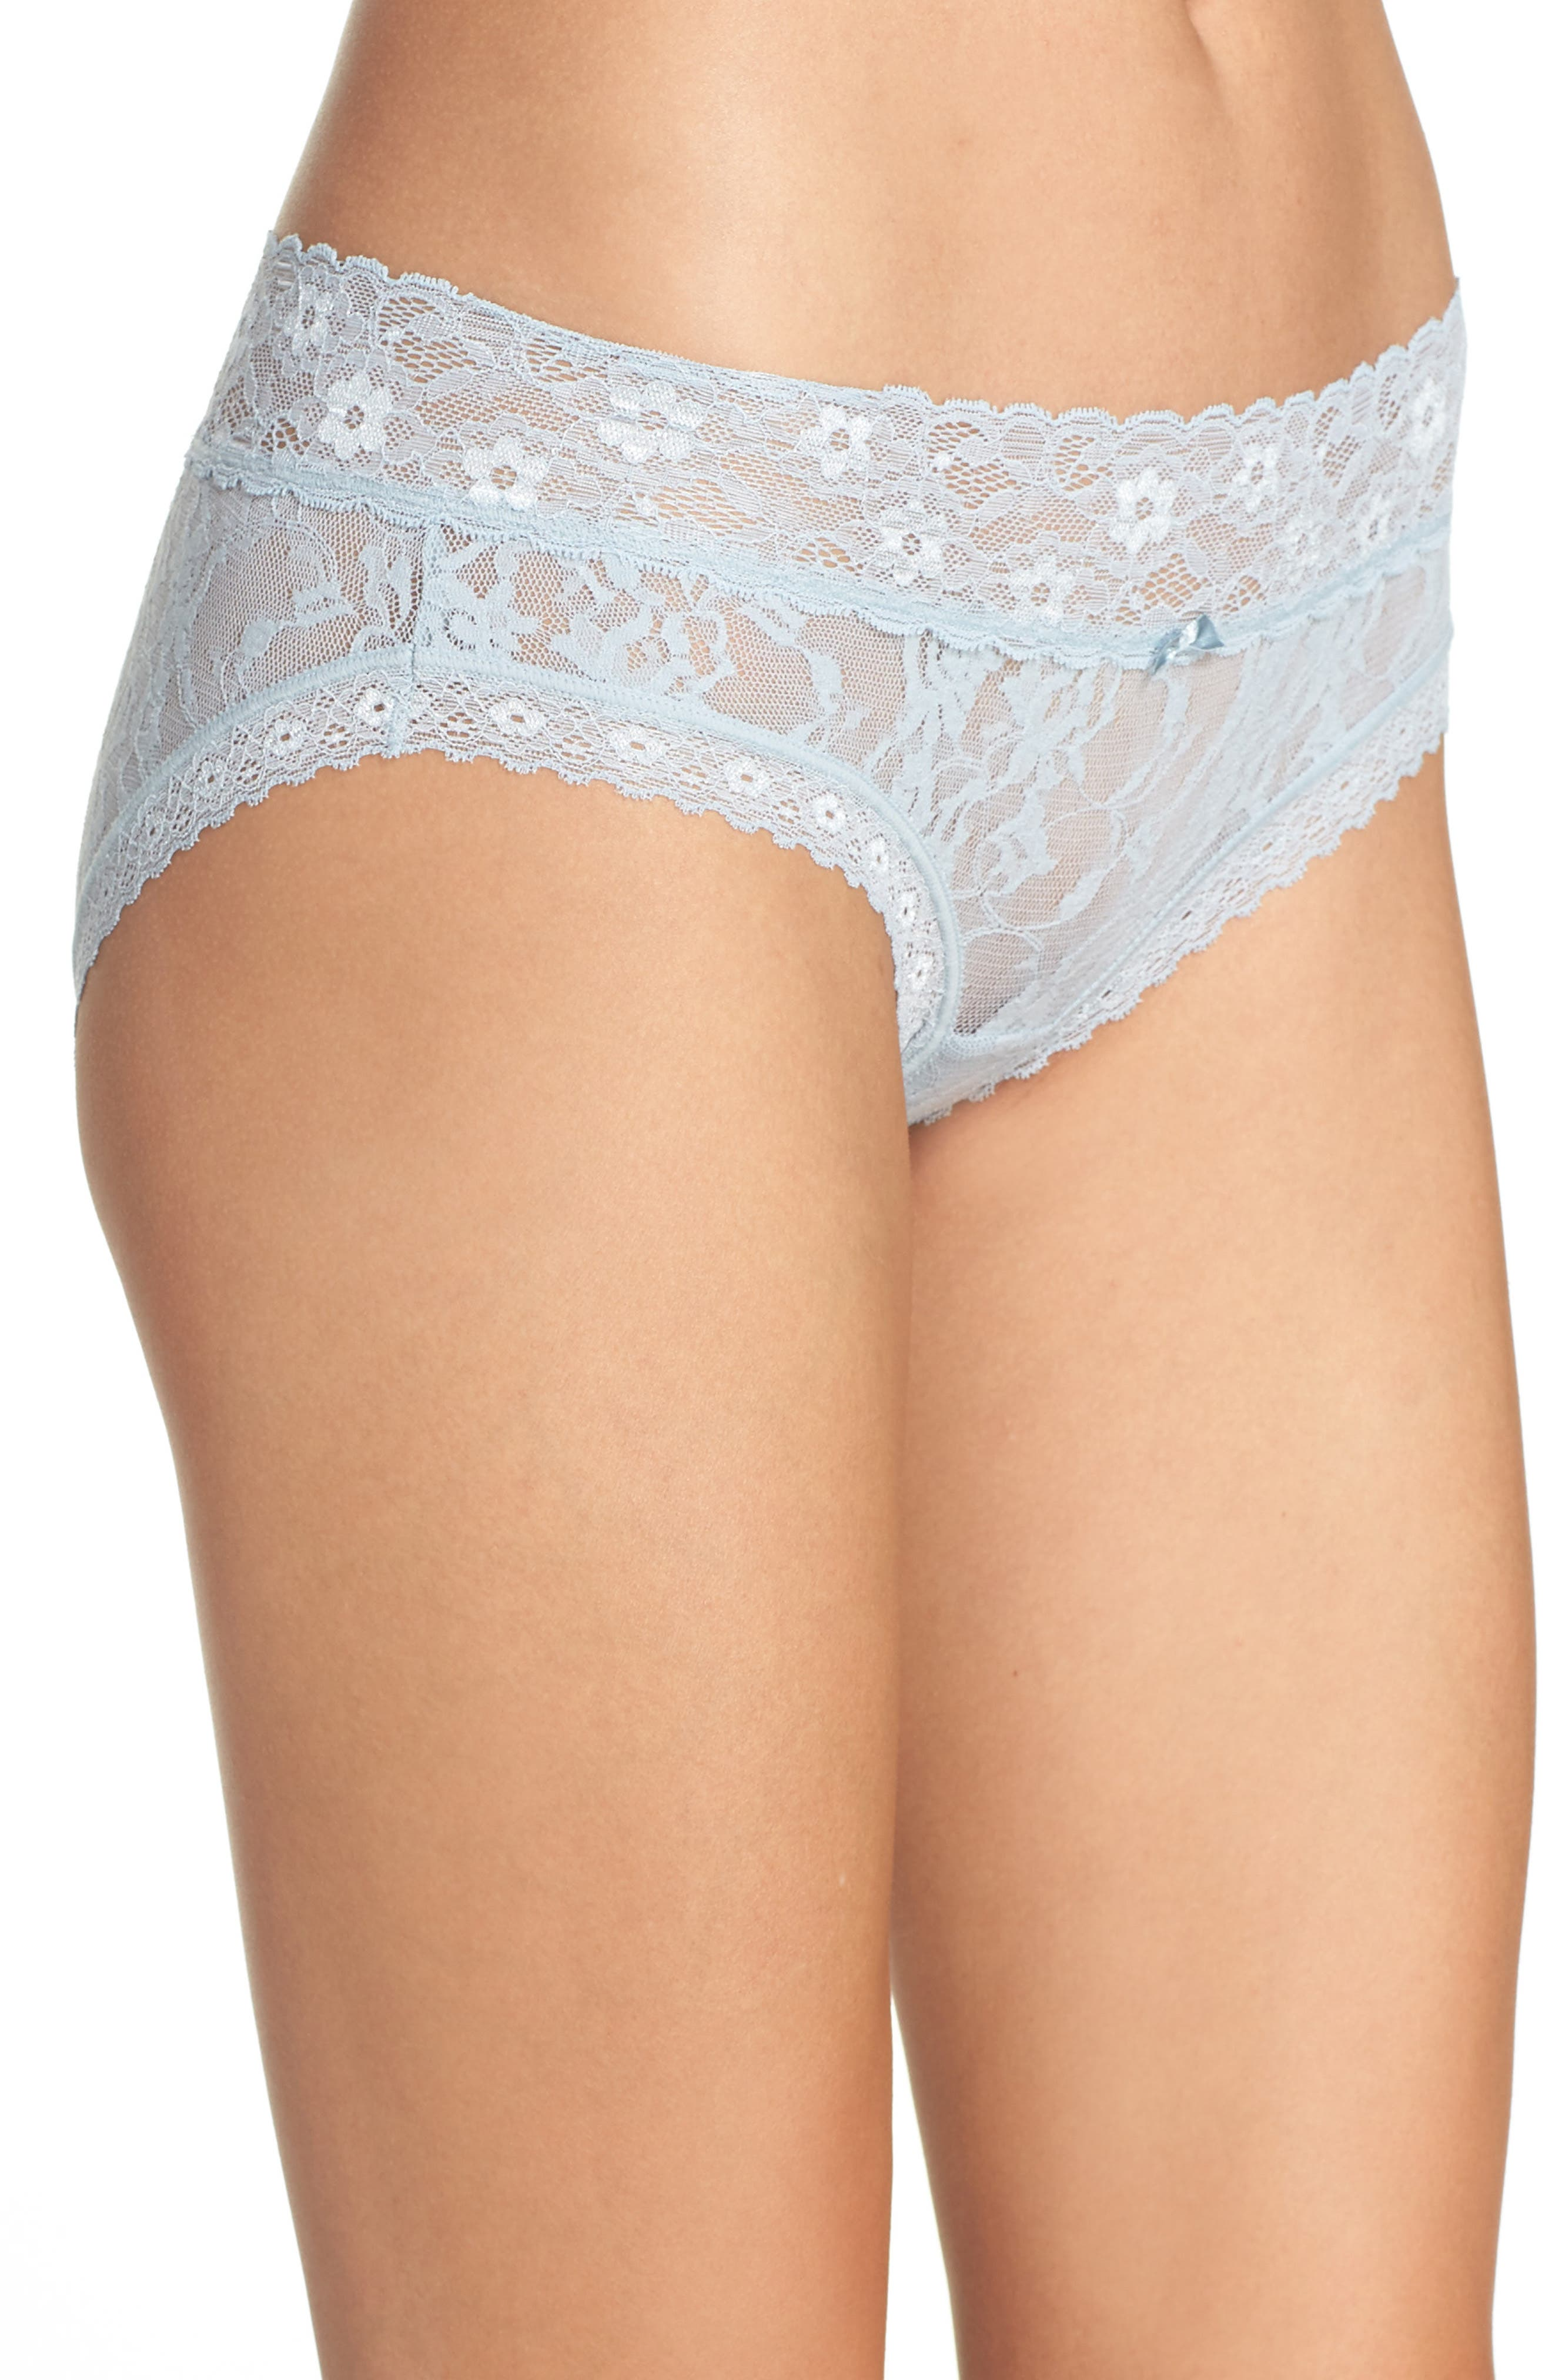 Alternate Image 3  - DKNY 'Signature Lace' Bikini (3 for $30)